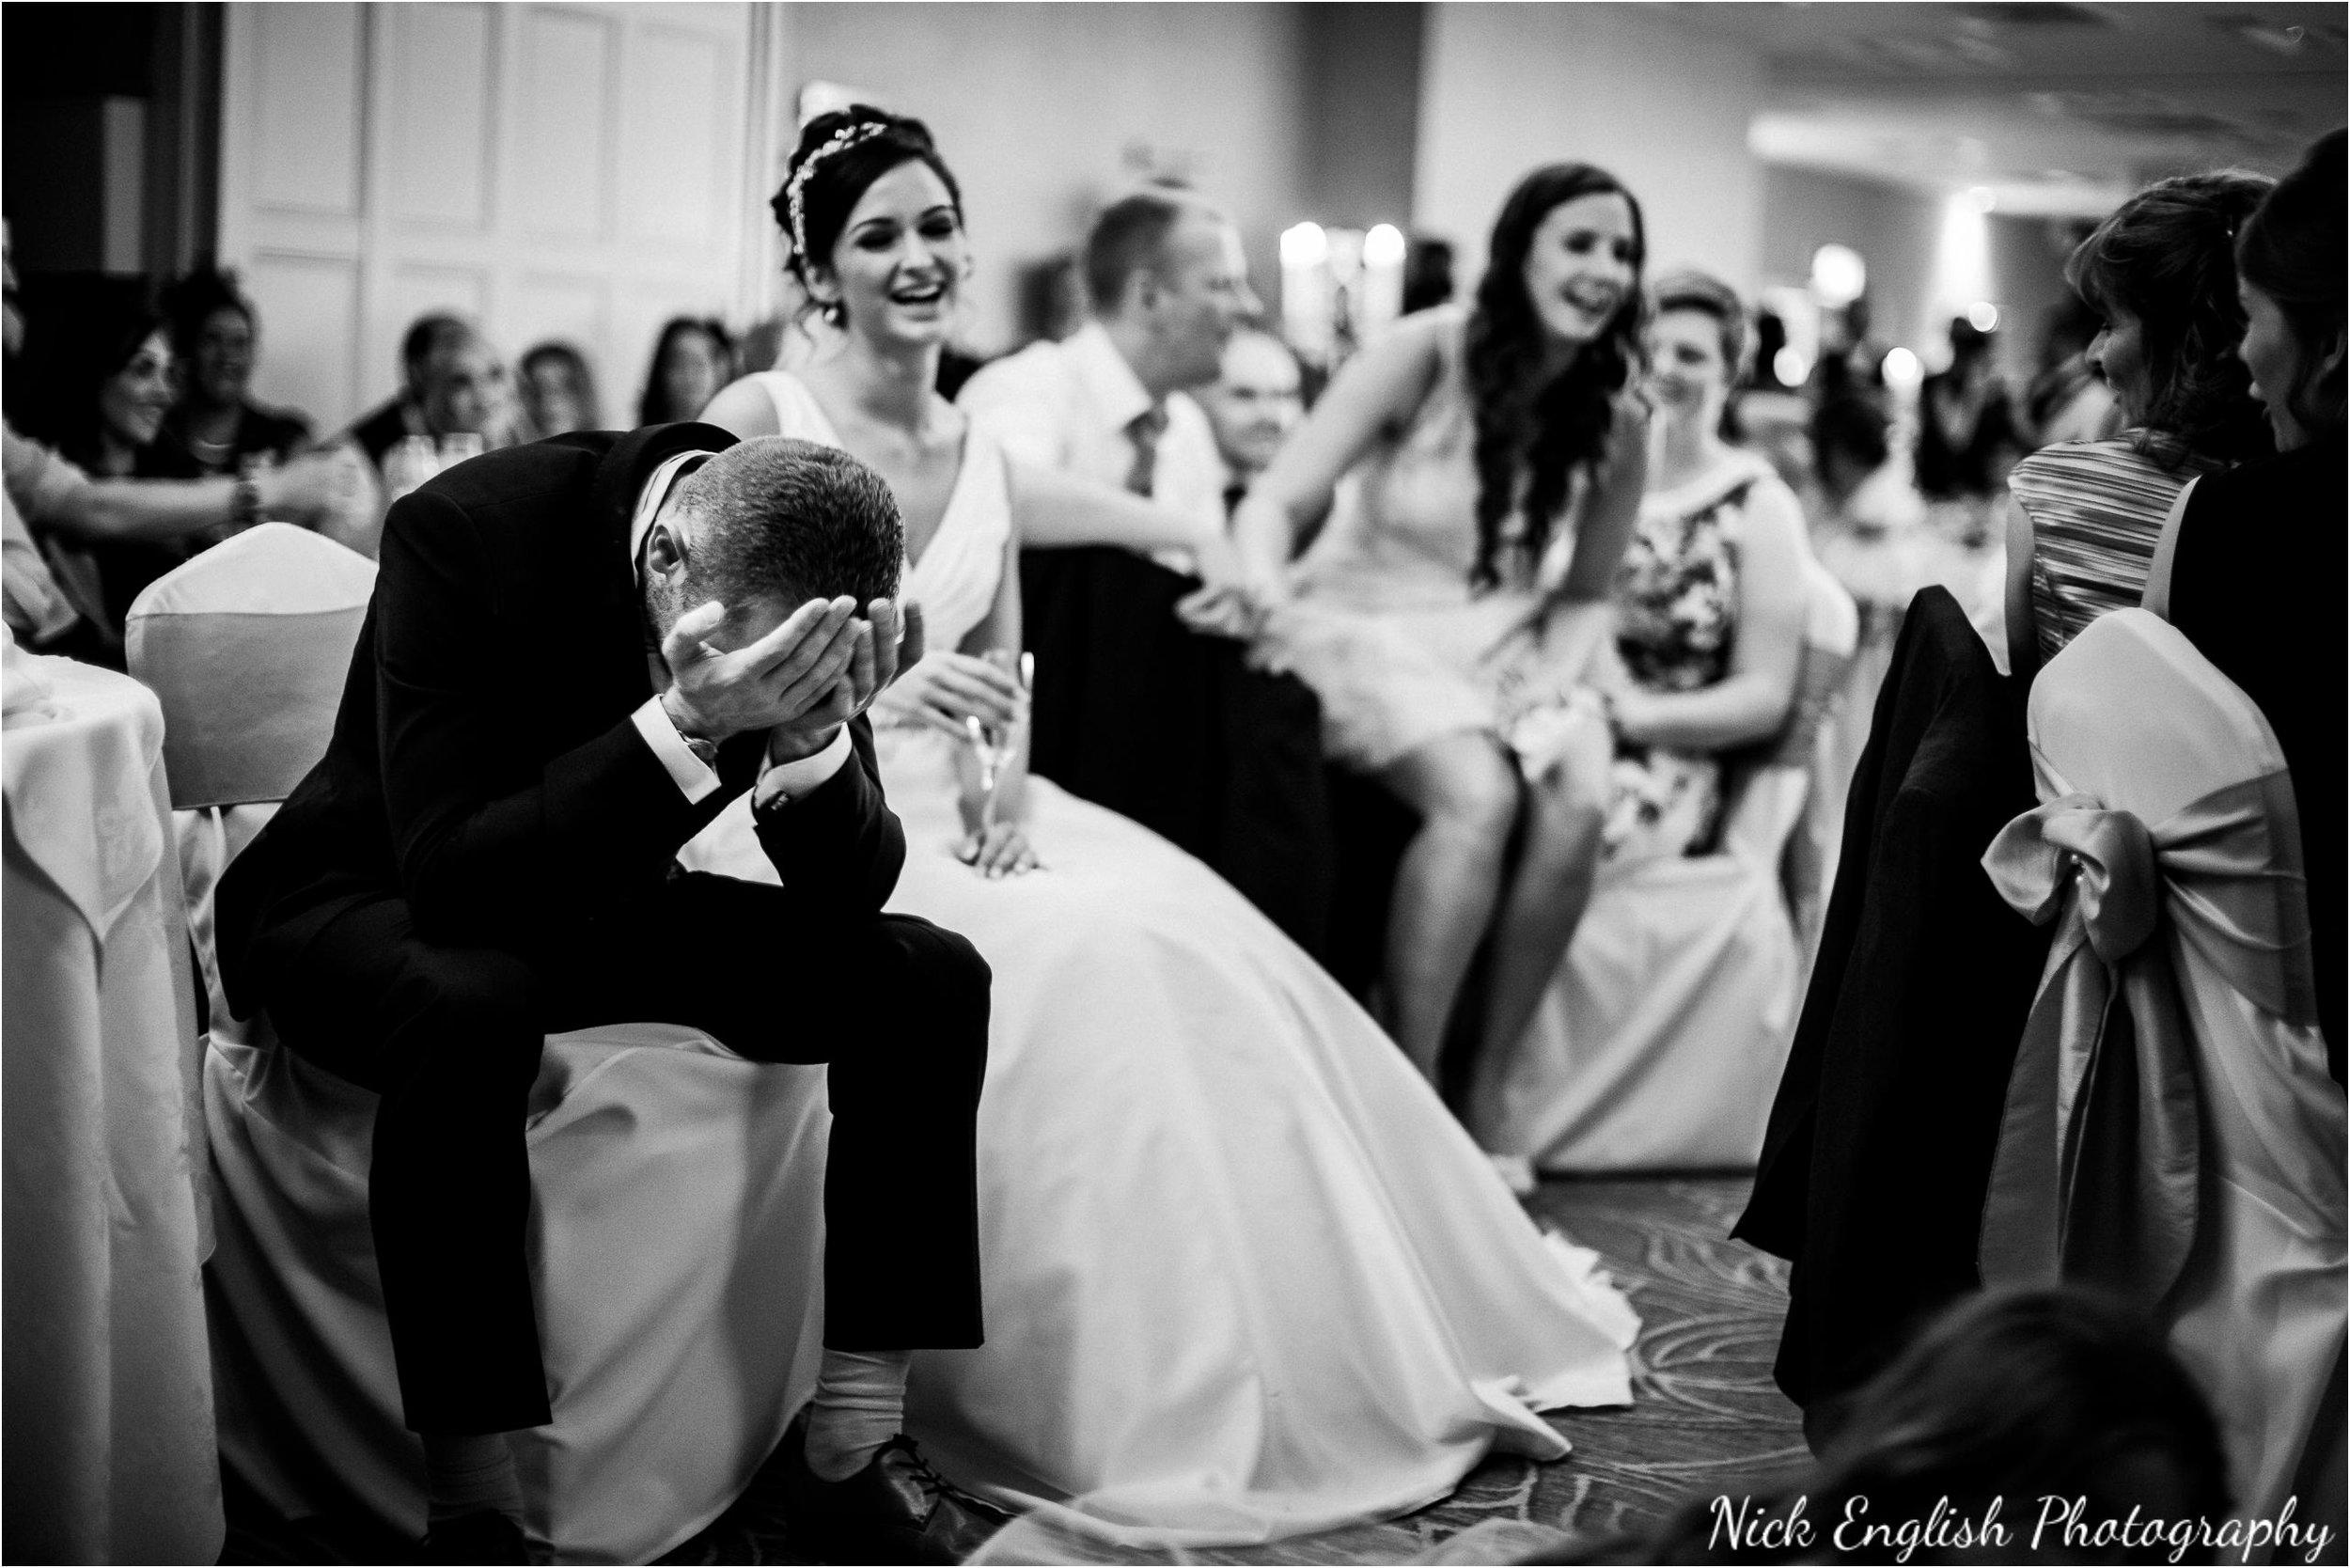 Emily David Wedding Photographs at Barton Grange Preston by Nick English Photography 183jpg.jpeg